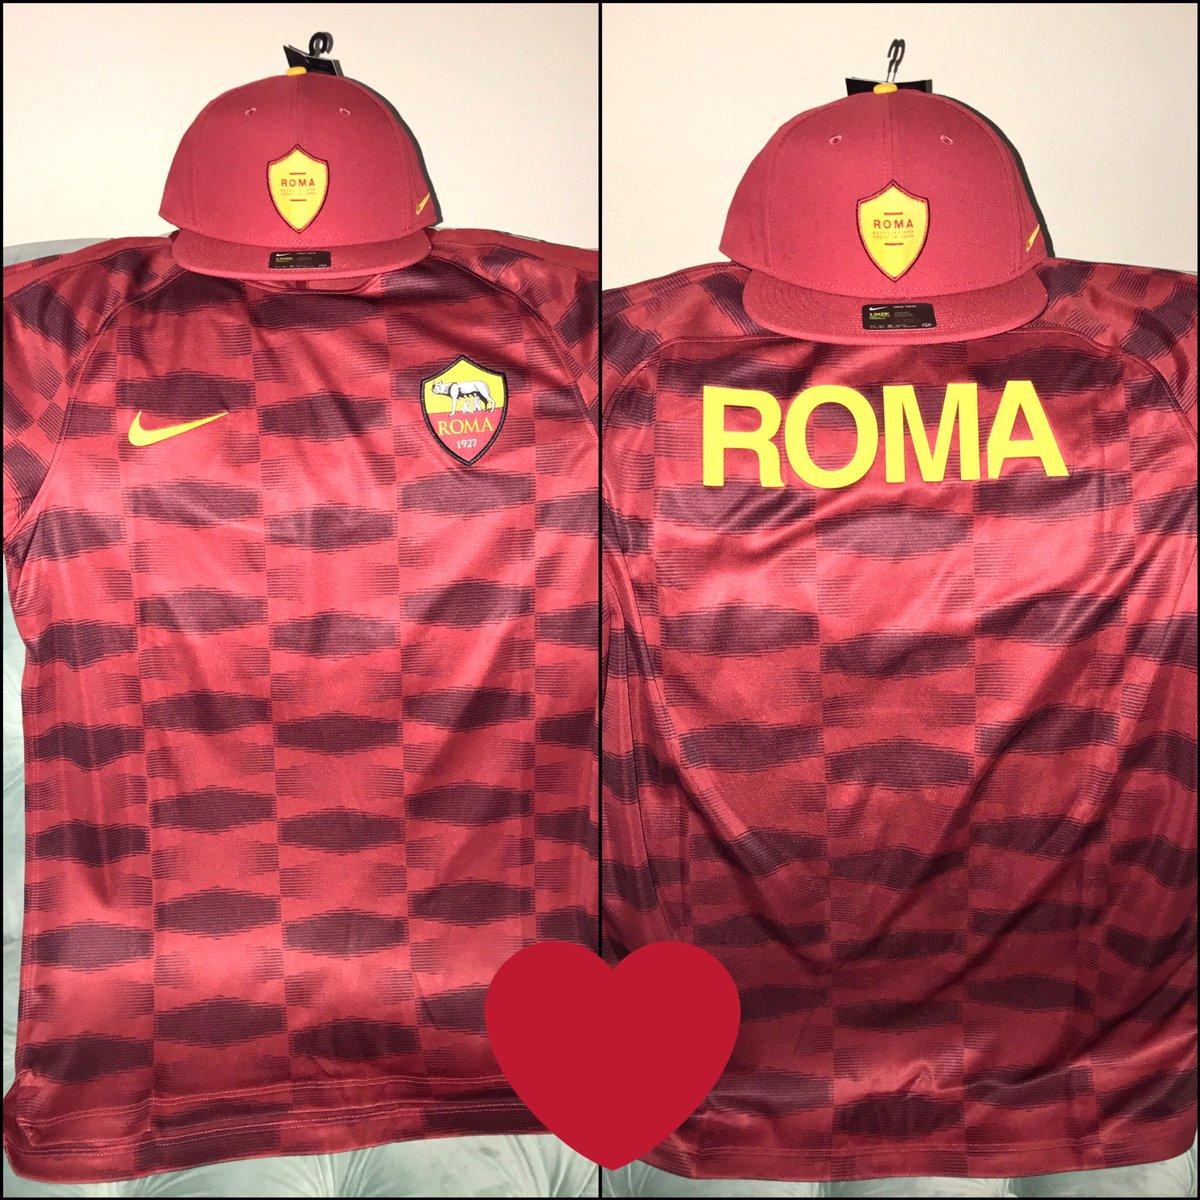 I Own it   #Roma #ForzaRoma   @Roma4EverNET @OfficialASRoma @ASRomaArabic @ASRomaEN @FirooRoma1 @RomaThings<br>http://pic.twitter.com/wkds0uuomh